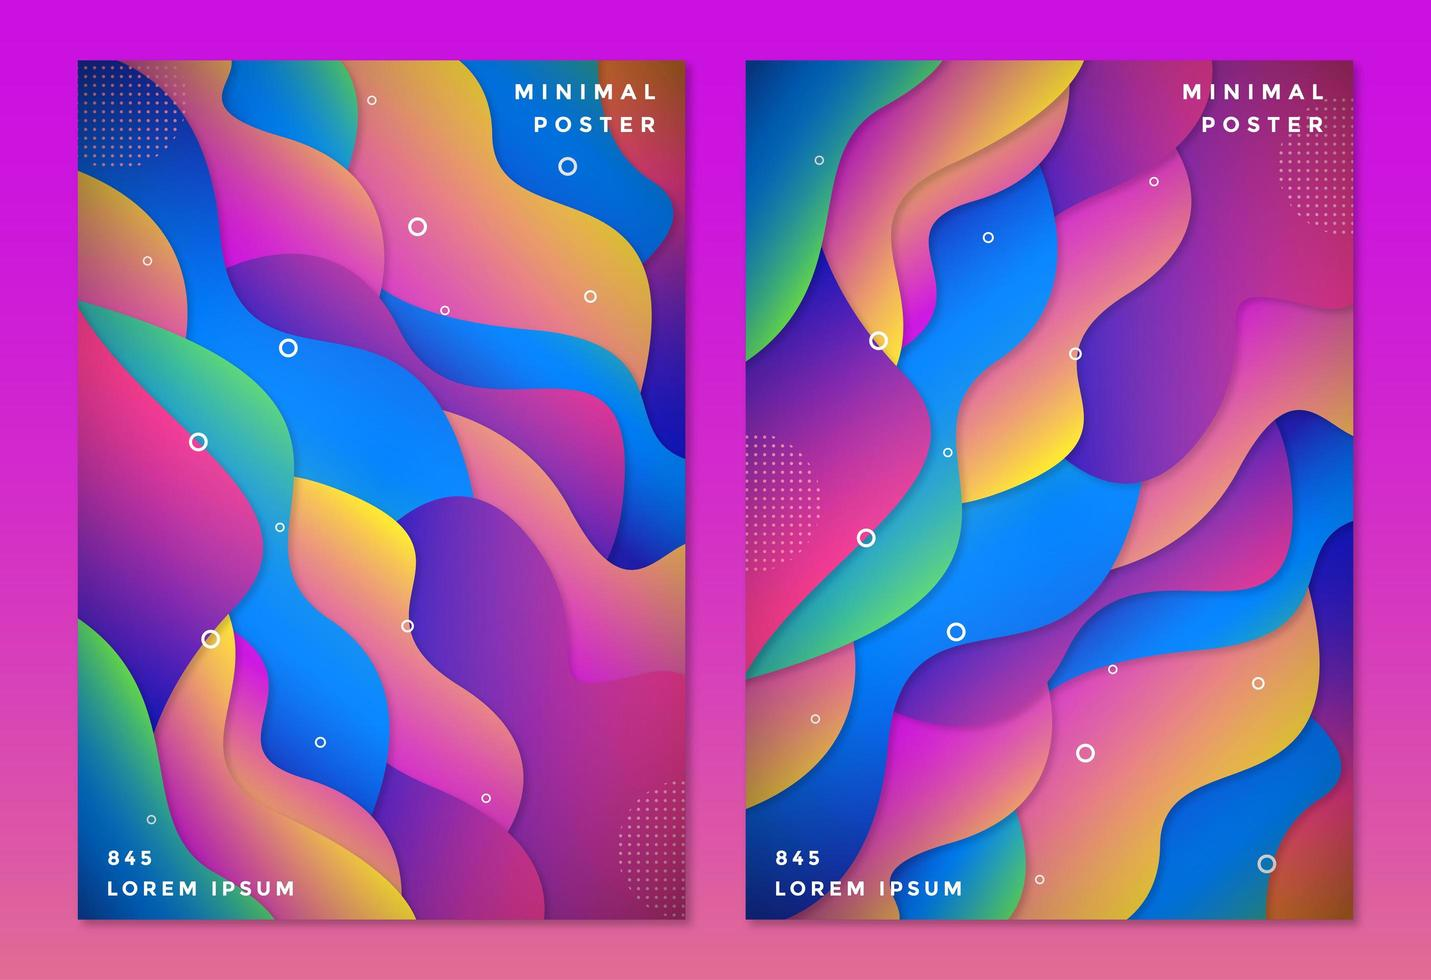 conjunto de capa de formas onduladas em camadas de cor gradiente vetor